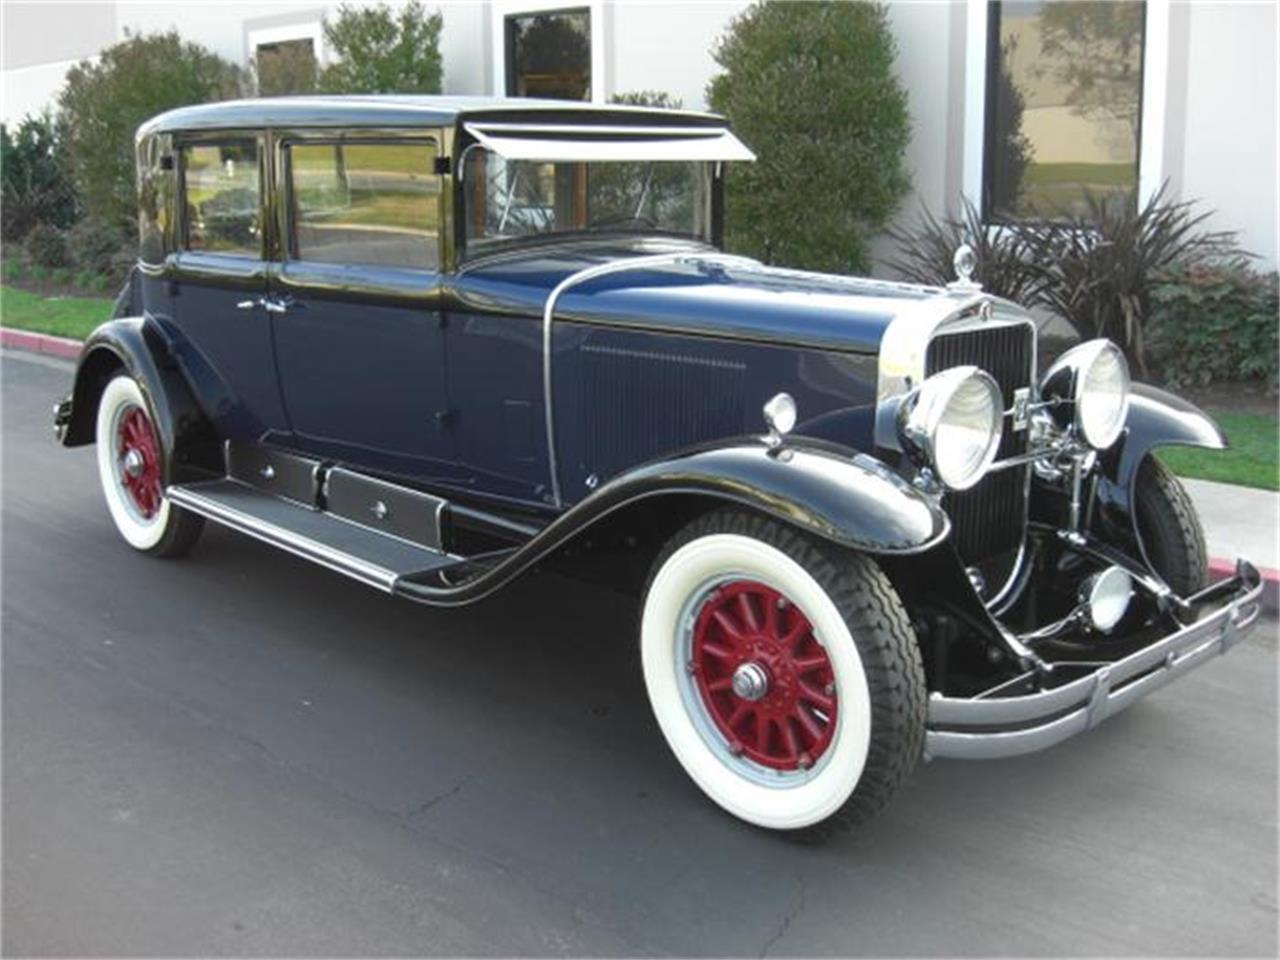 Cheap Cadillac Cars For Sale